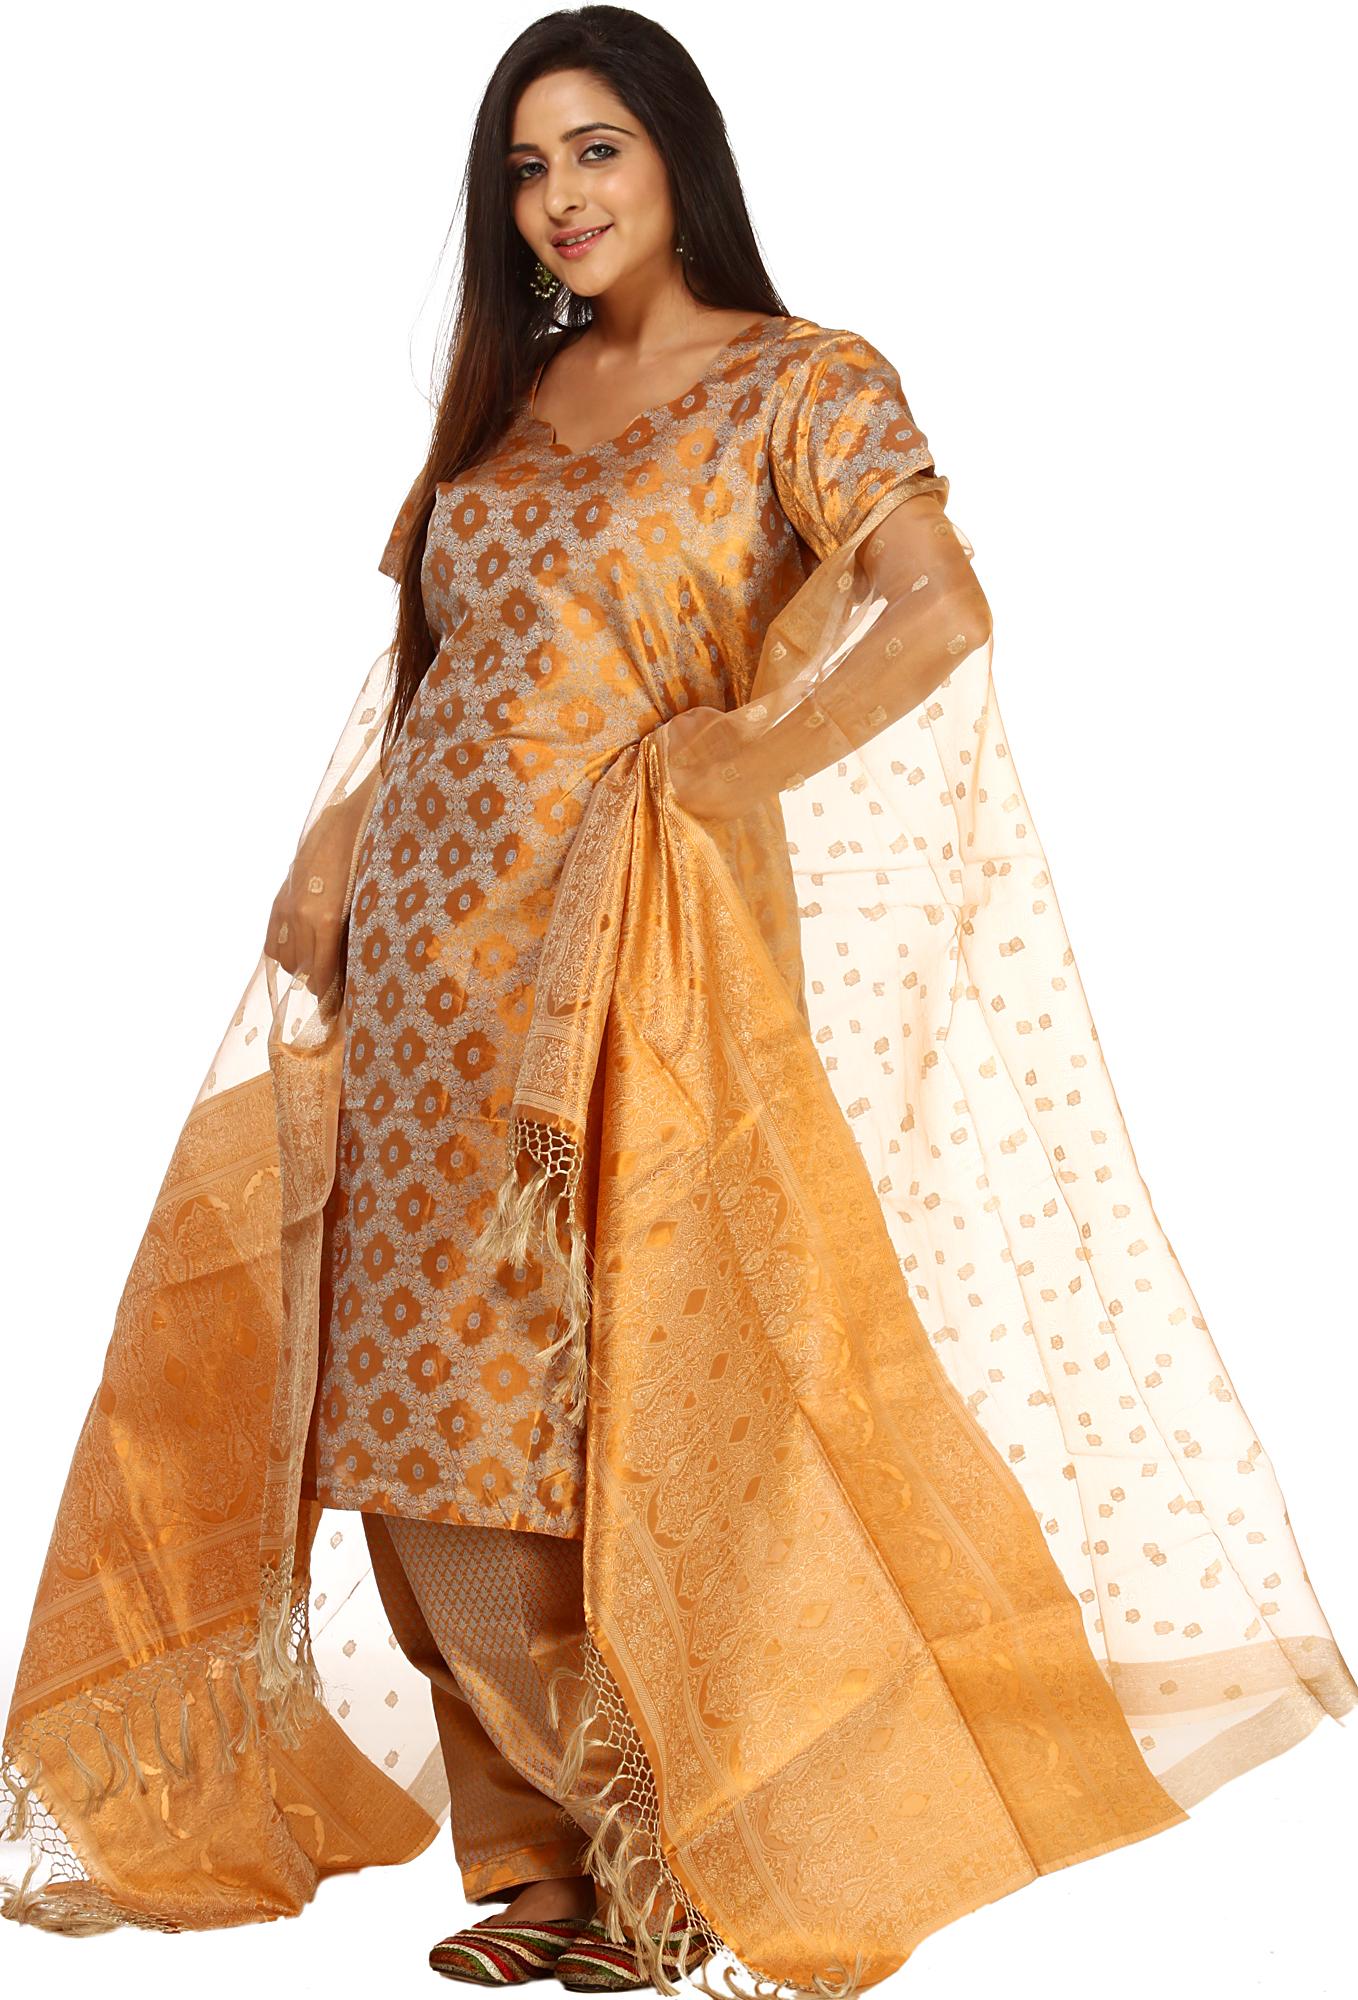 Golden Kora Salwar Kameez Suit With Banarasi Weave All Over